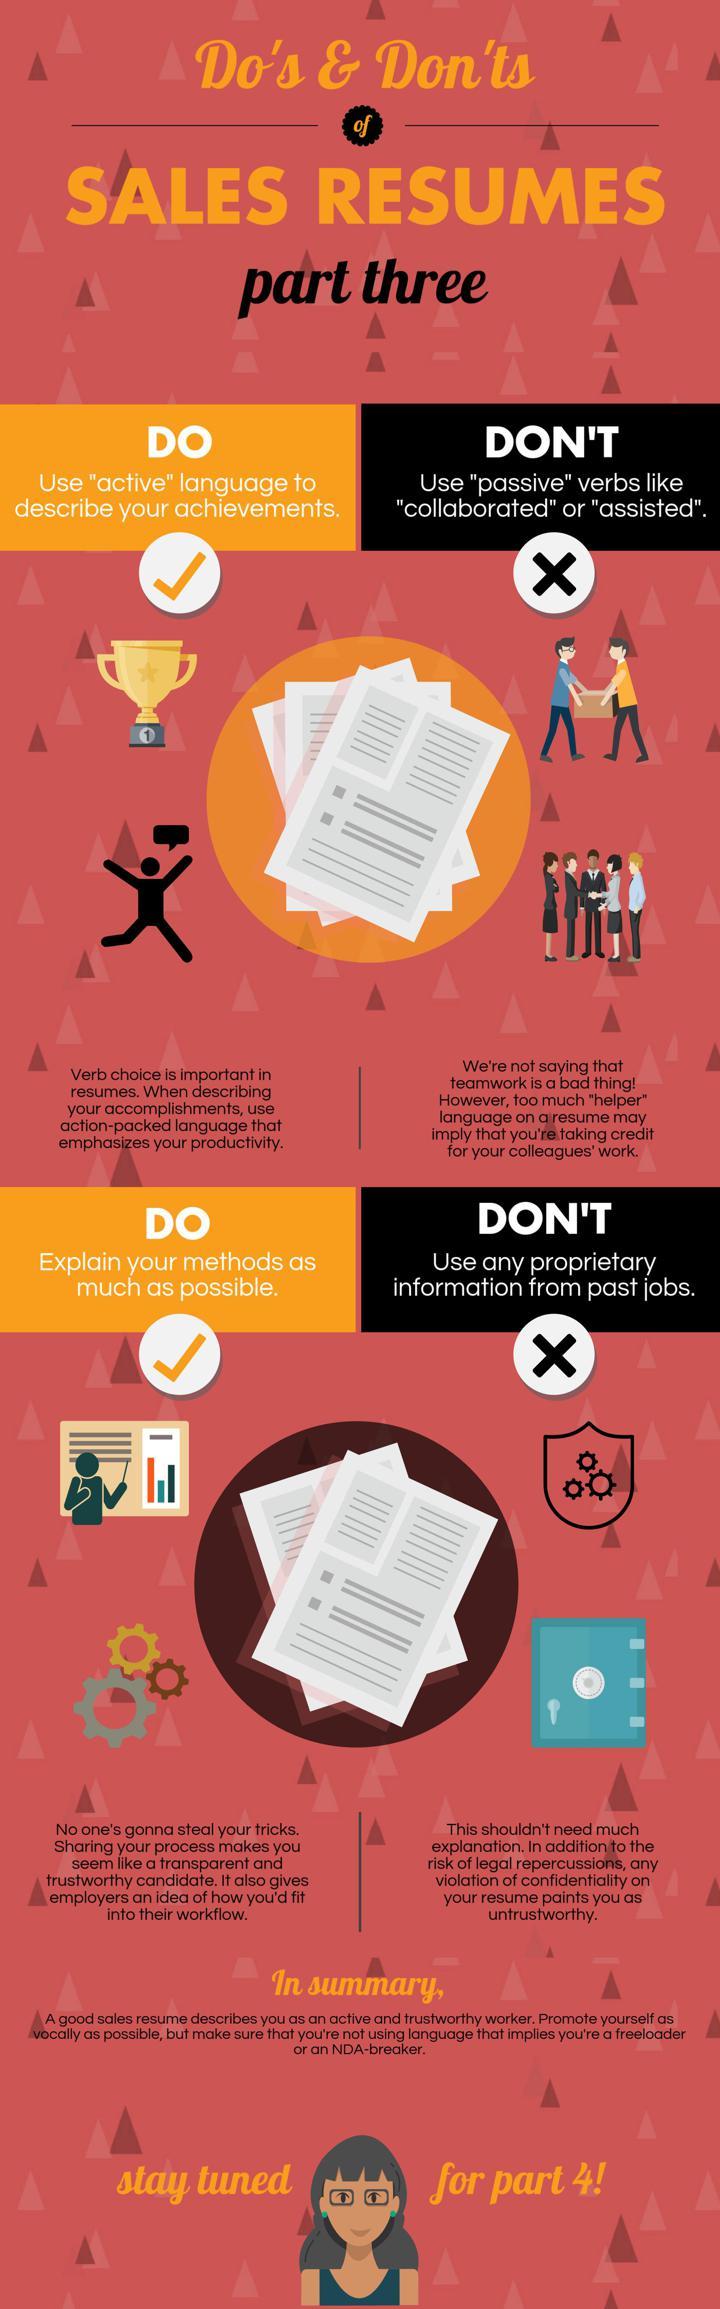 sales-resume-infographic